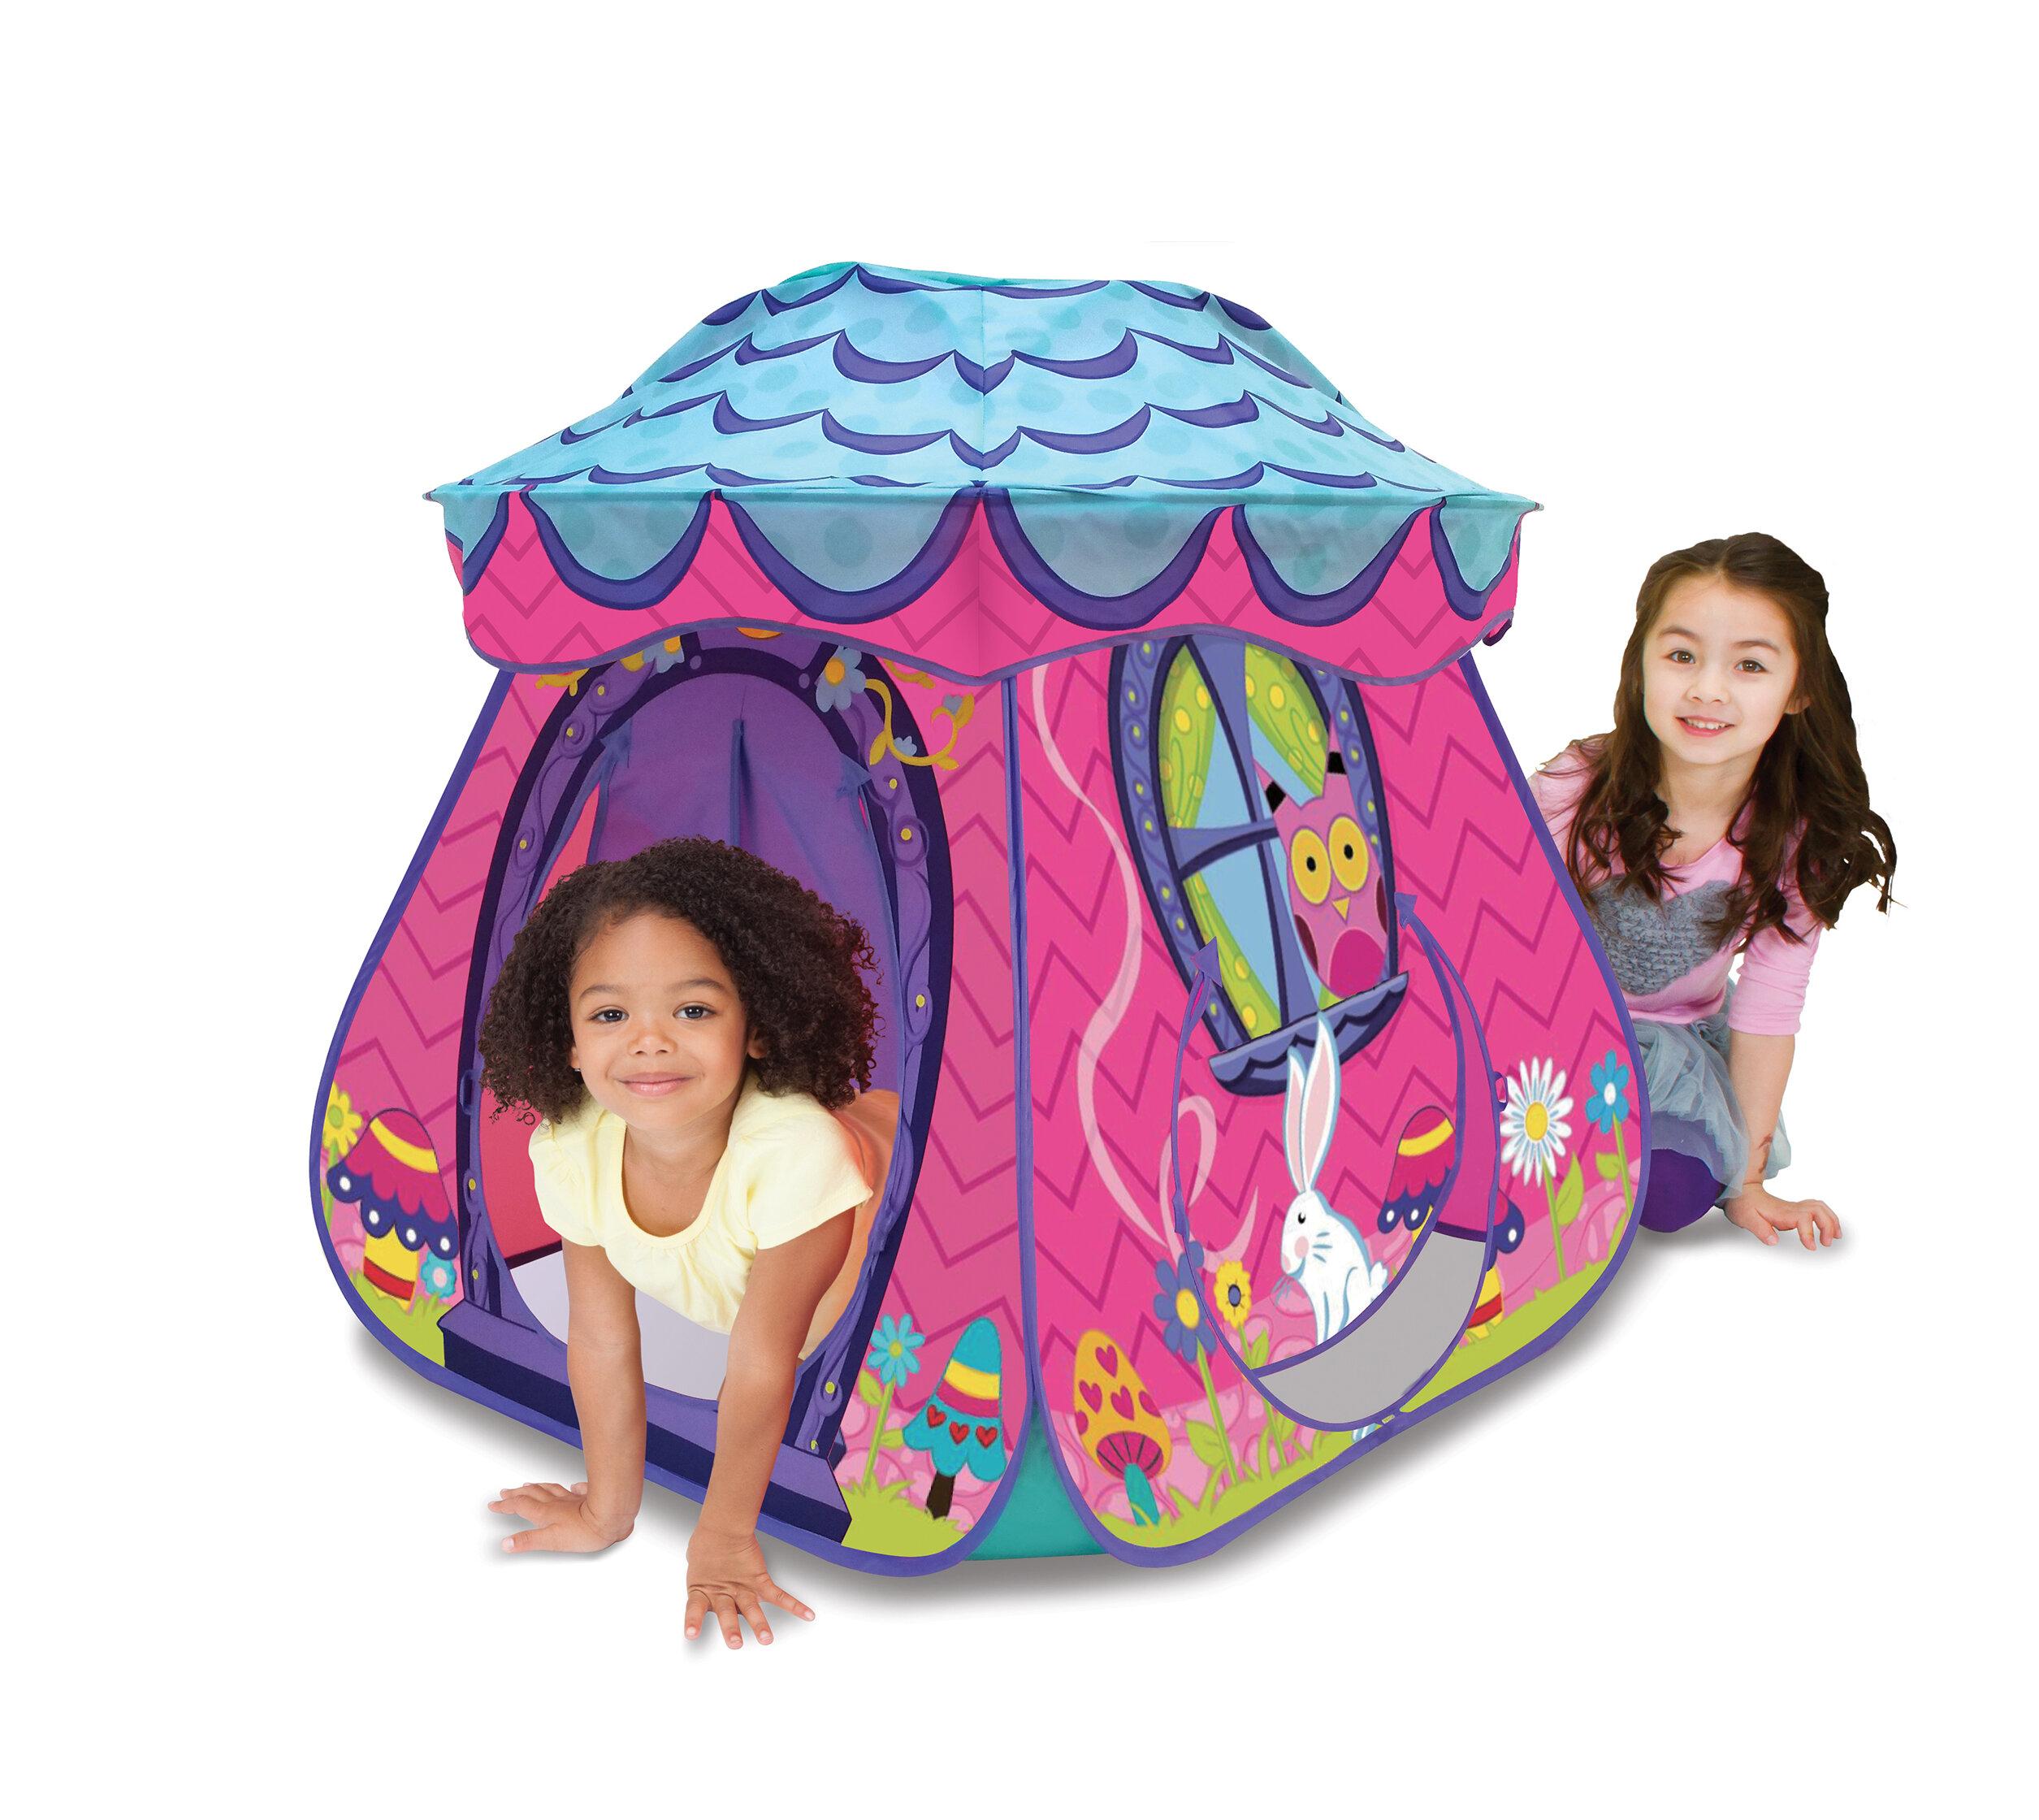 sc 1 st  Wayfair & Playhut Village Cottage Play Tent u0026 Reviews   Wayfair